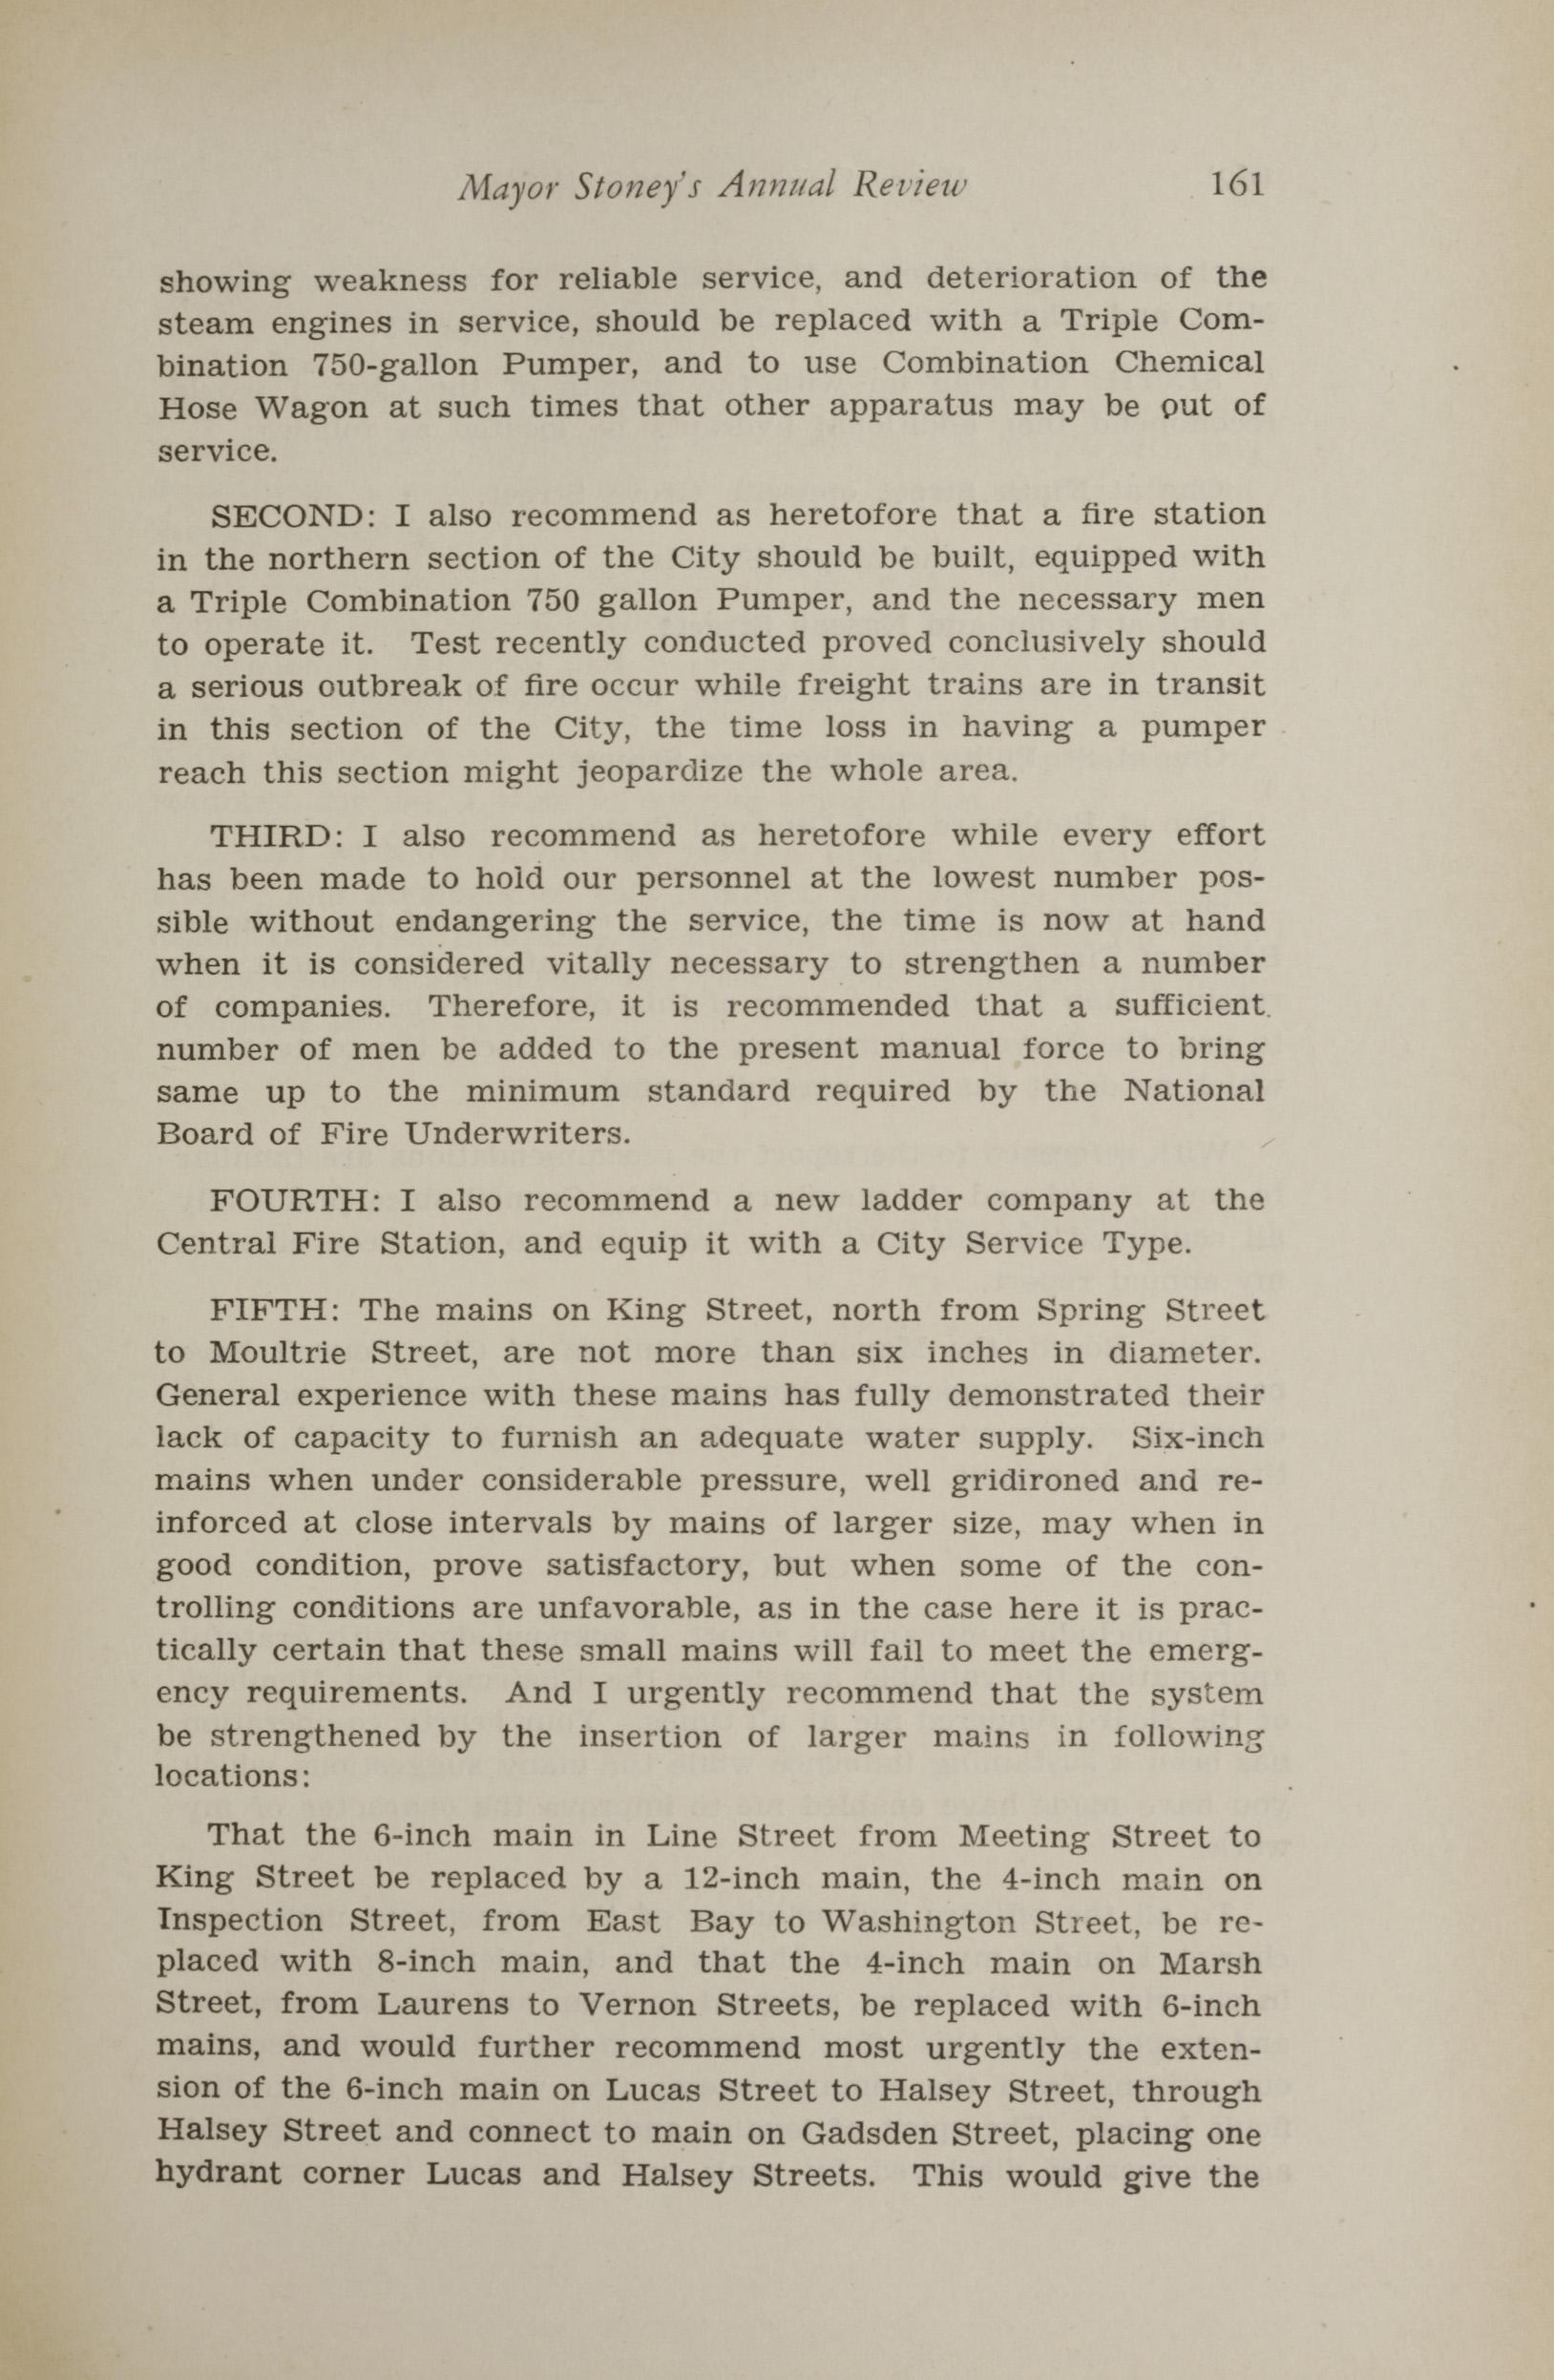 Charleston Yearbook, 1930, page 161